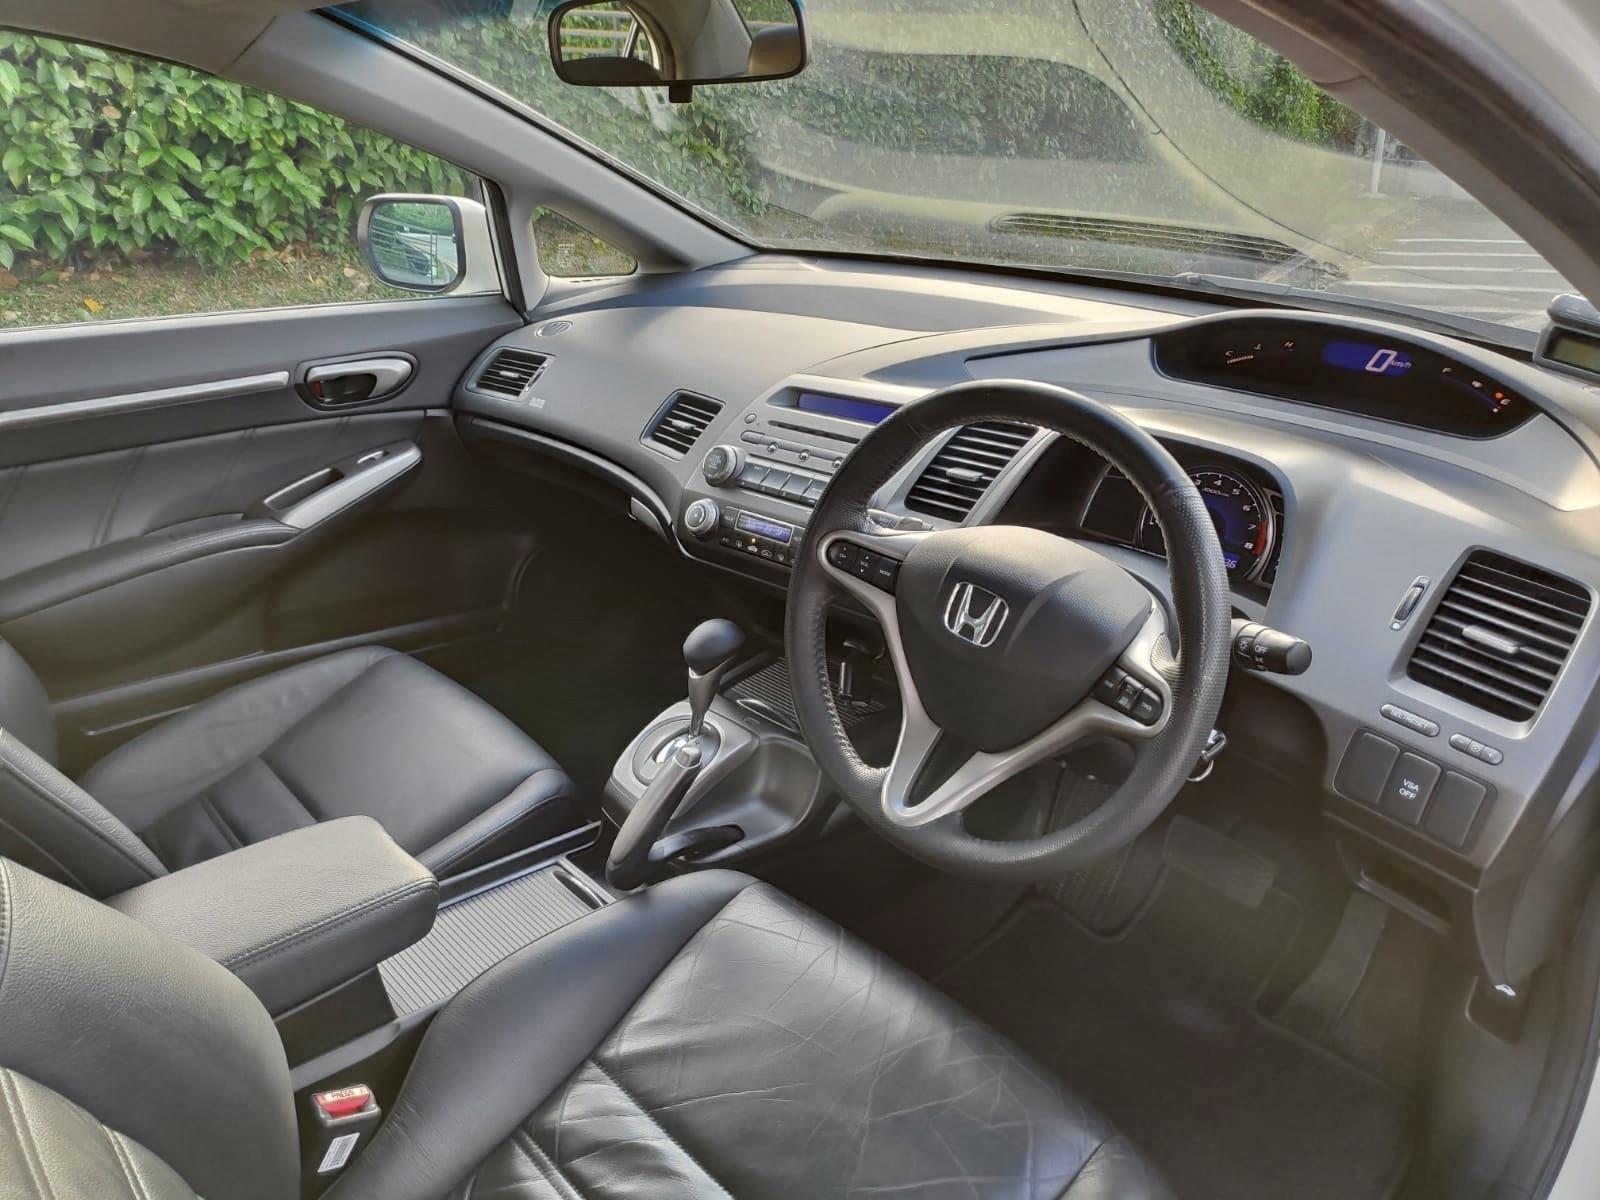 Honda Civic 2.0 Auto